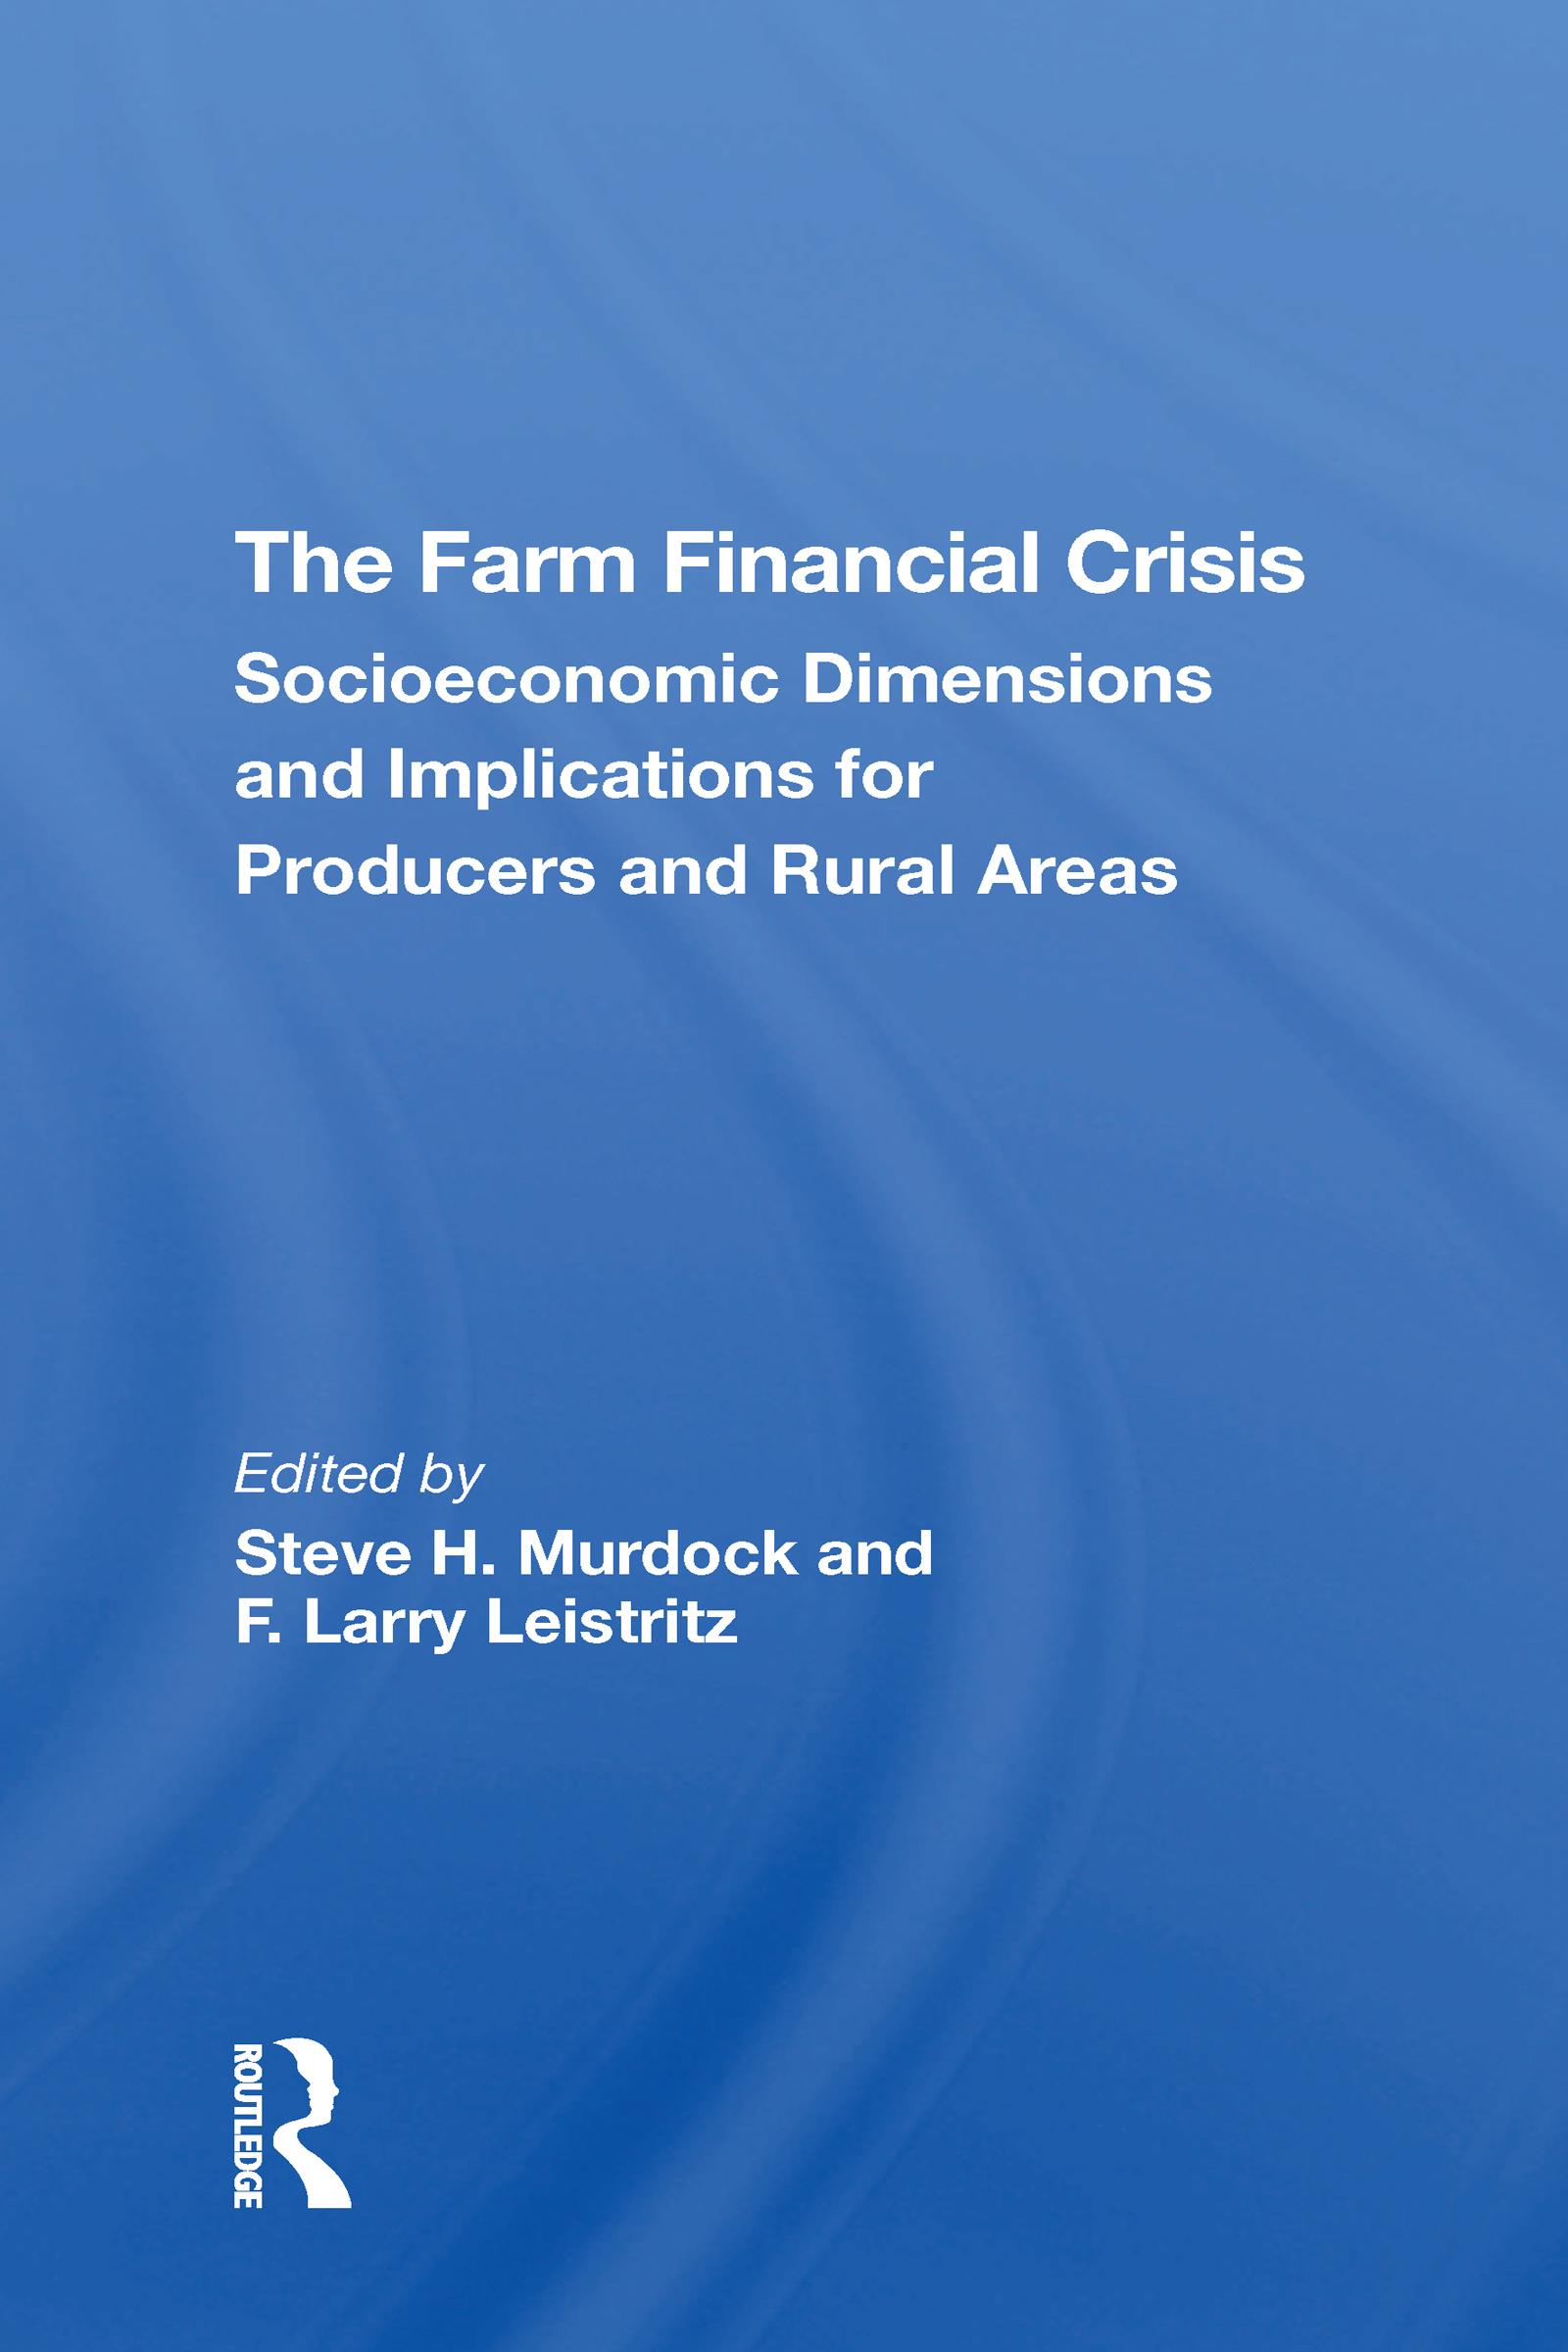 The Farm Financial Crisis